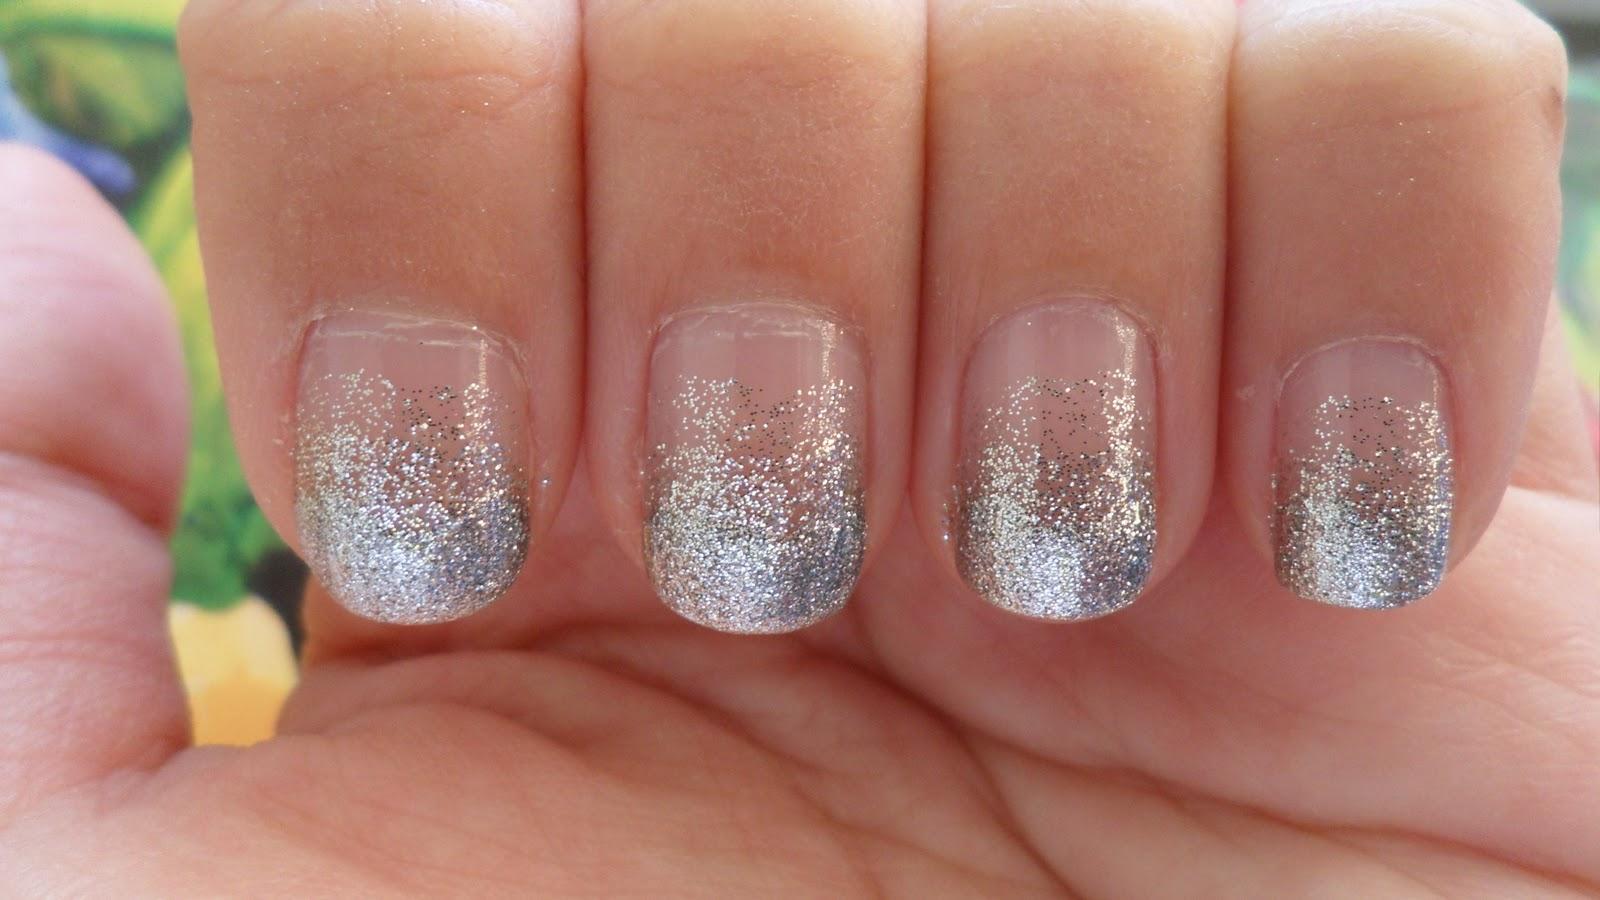 Glittery gradient nails